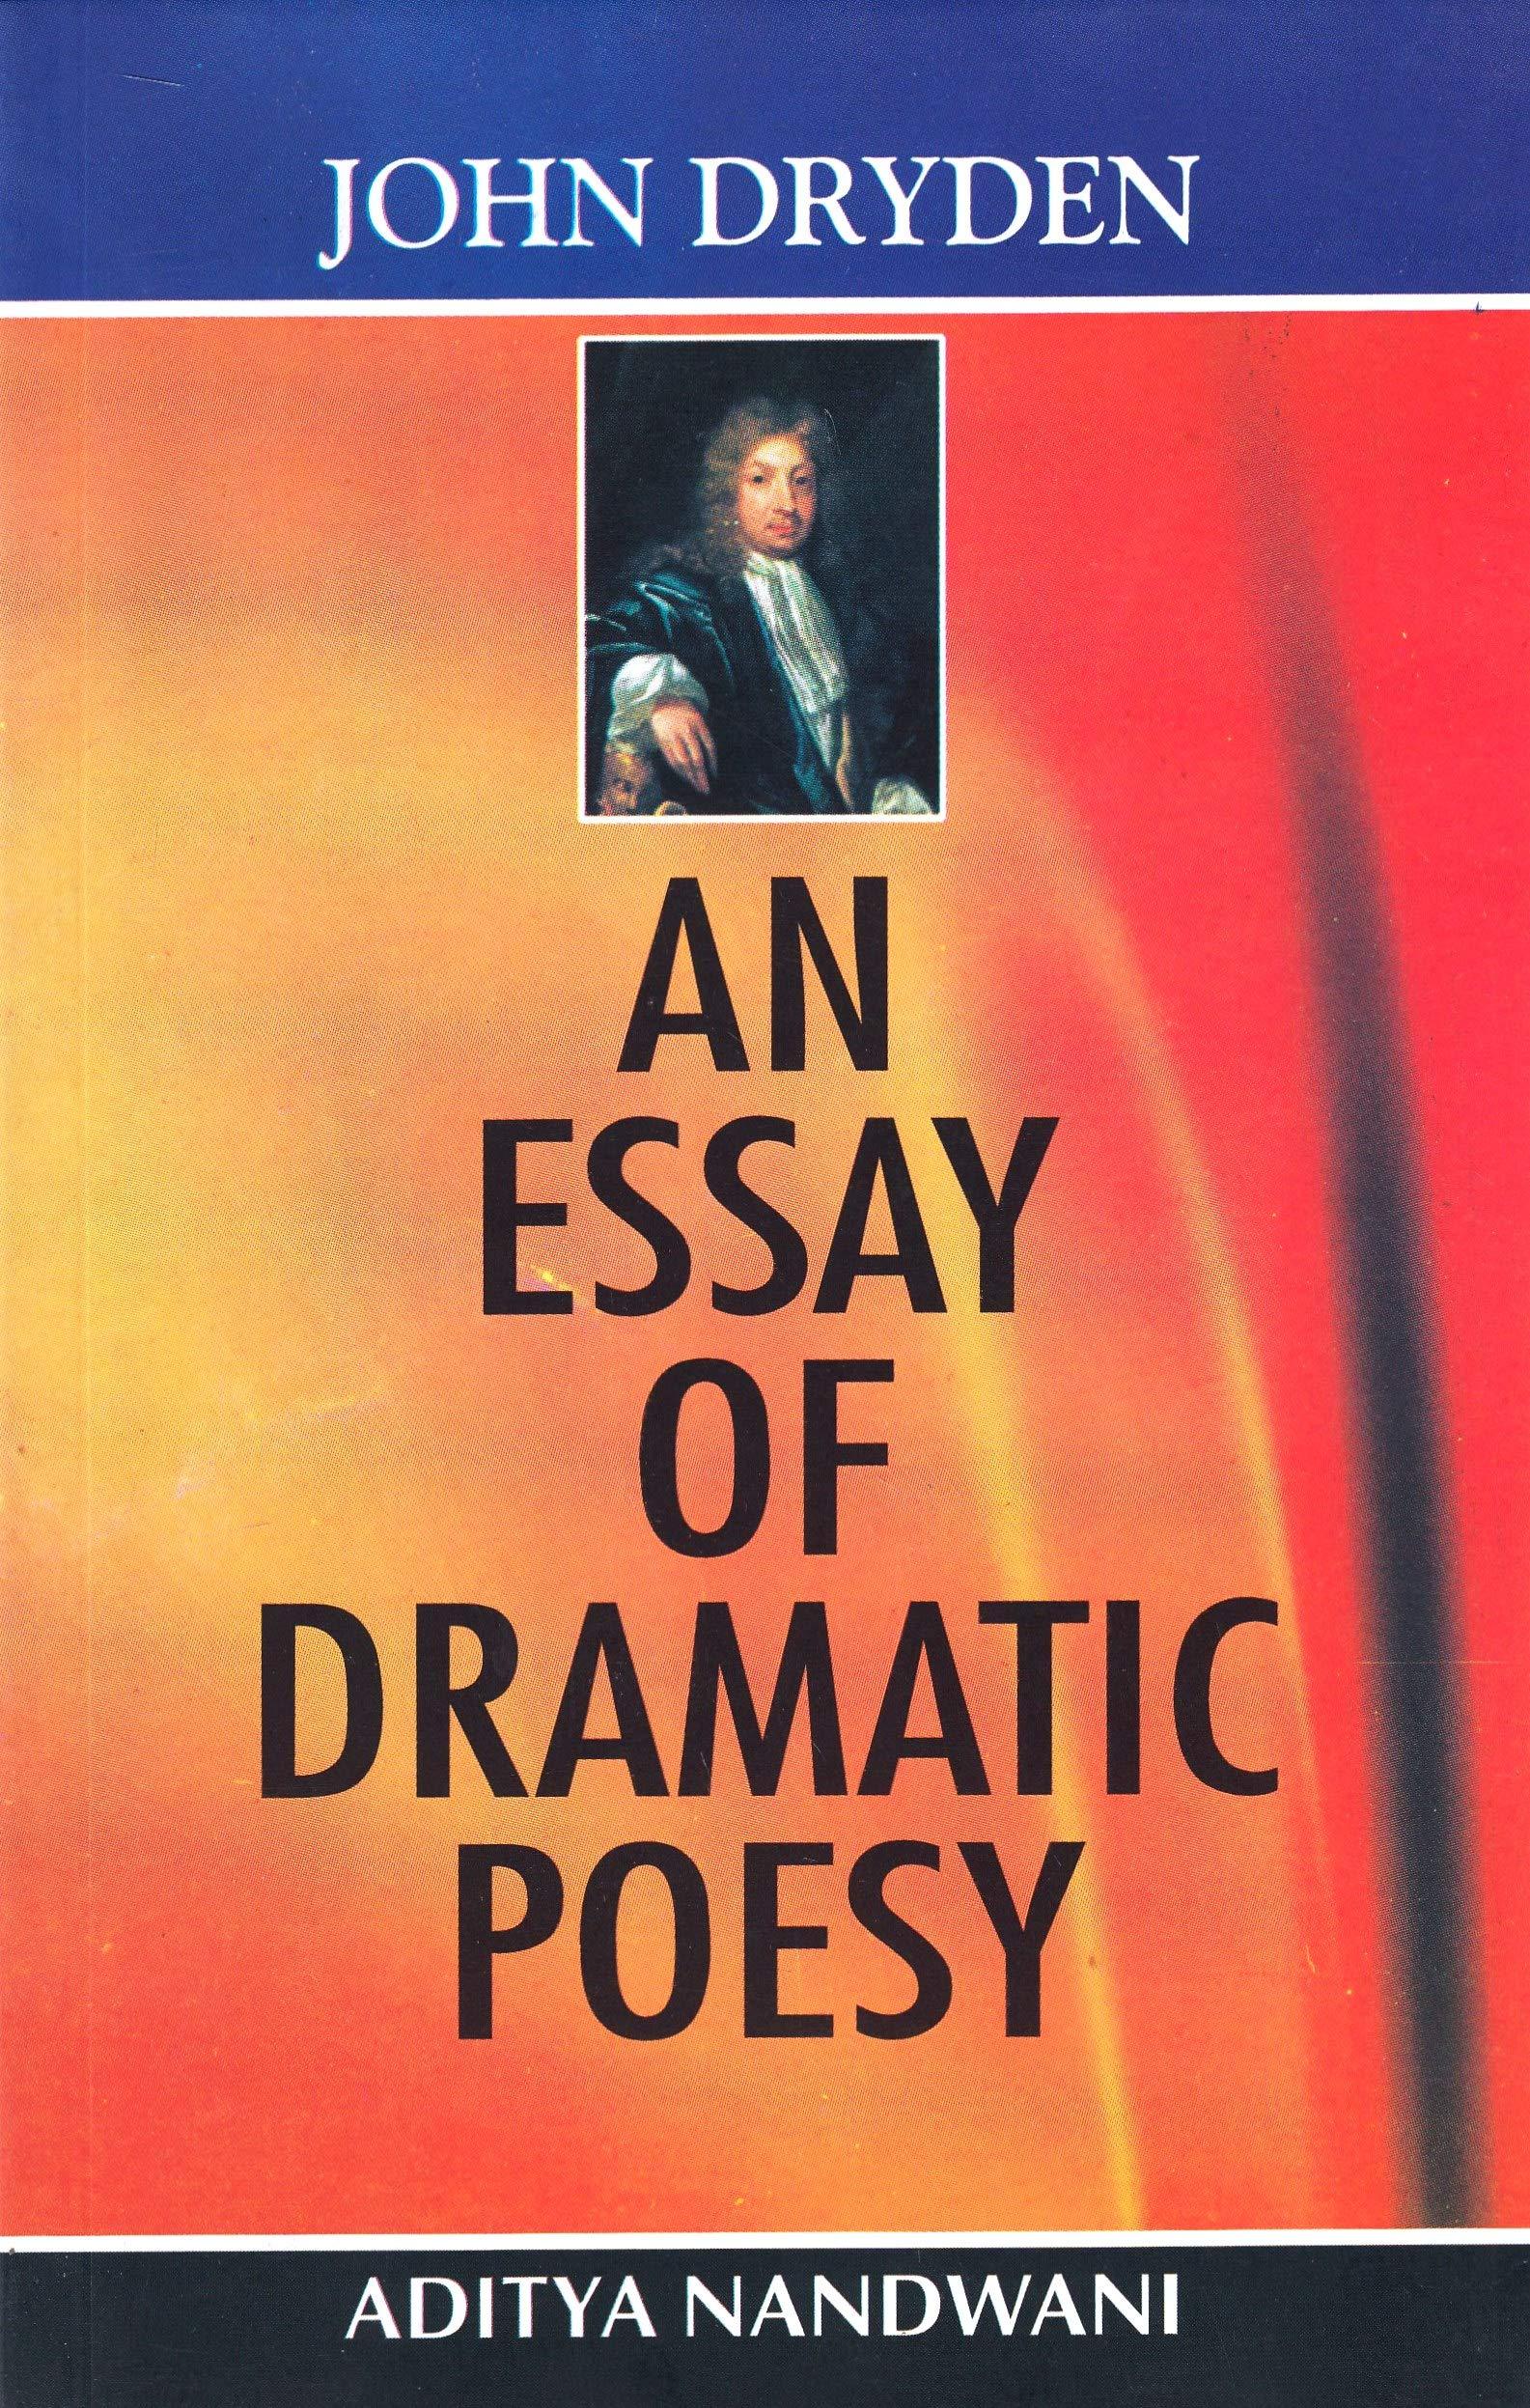 an essay of dramatic poesy by john dryden